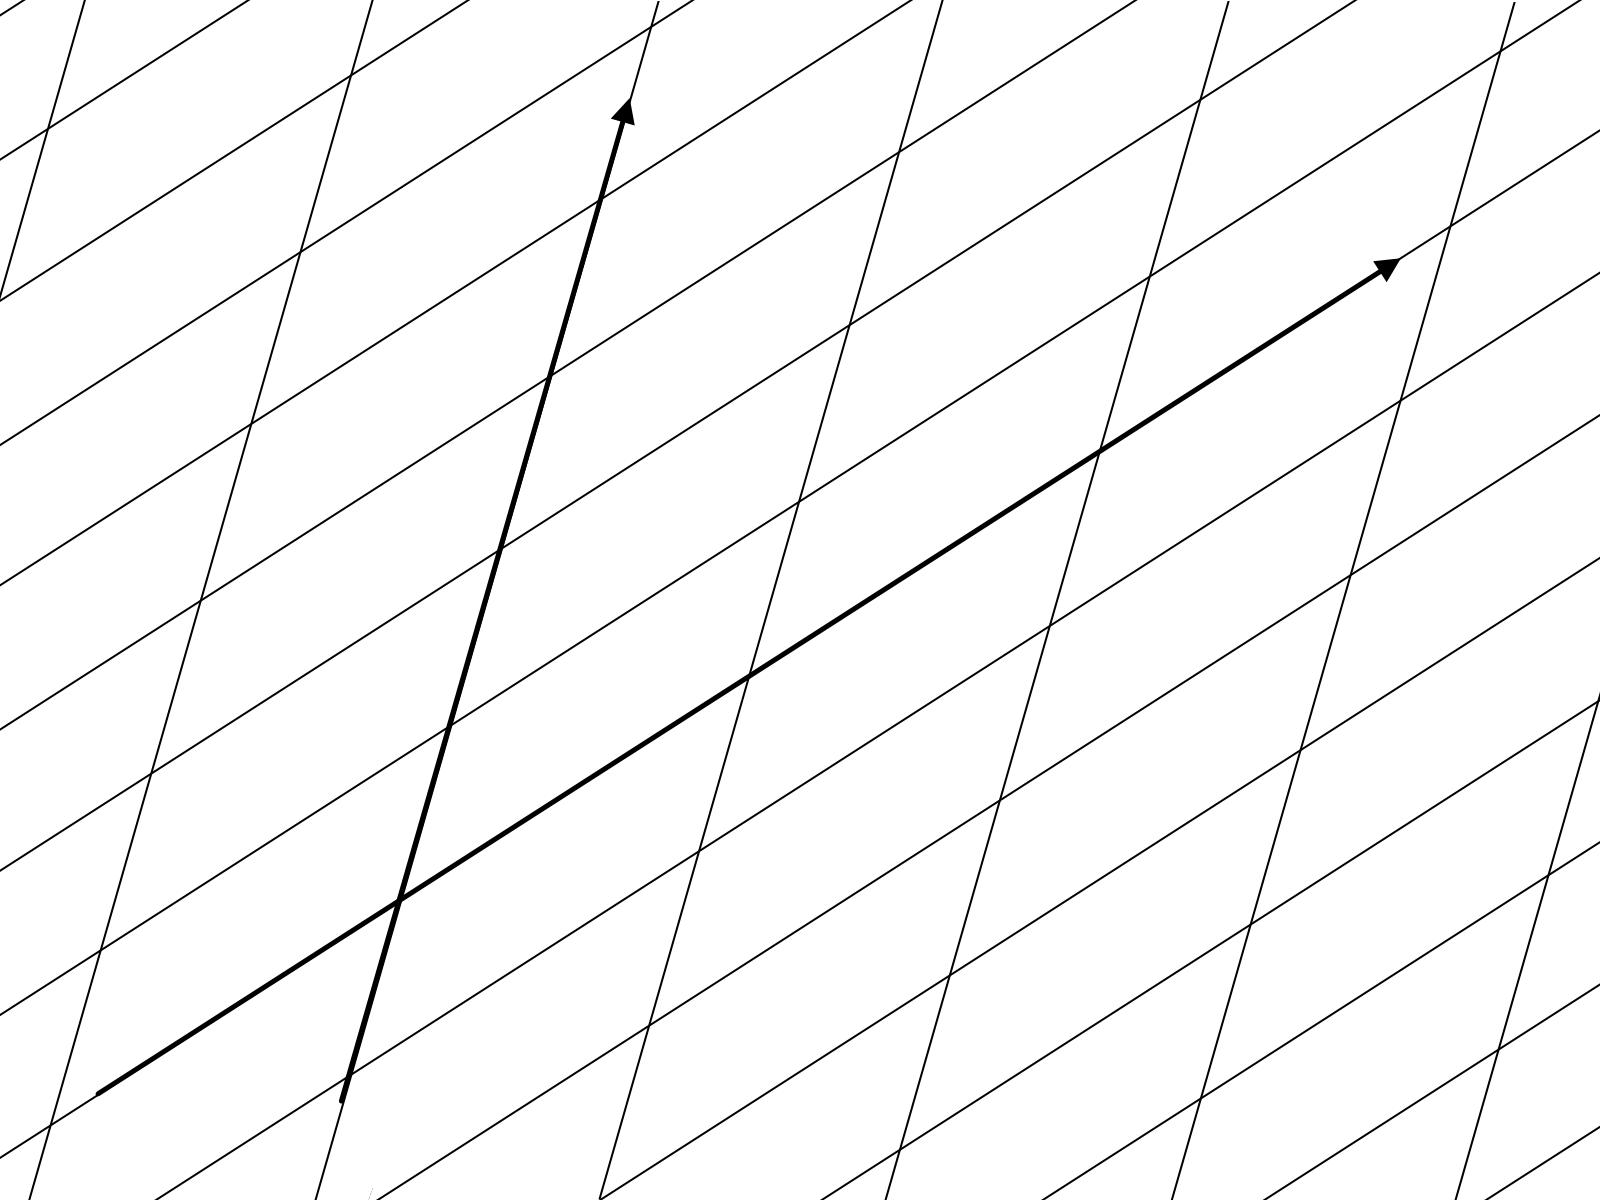 https://remedics.air-nifty.com/photos/uncategorized/tensor24_20210725014501.png